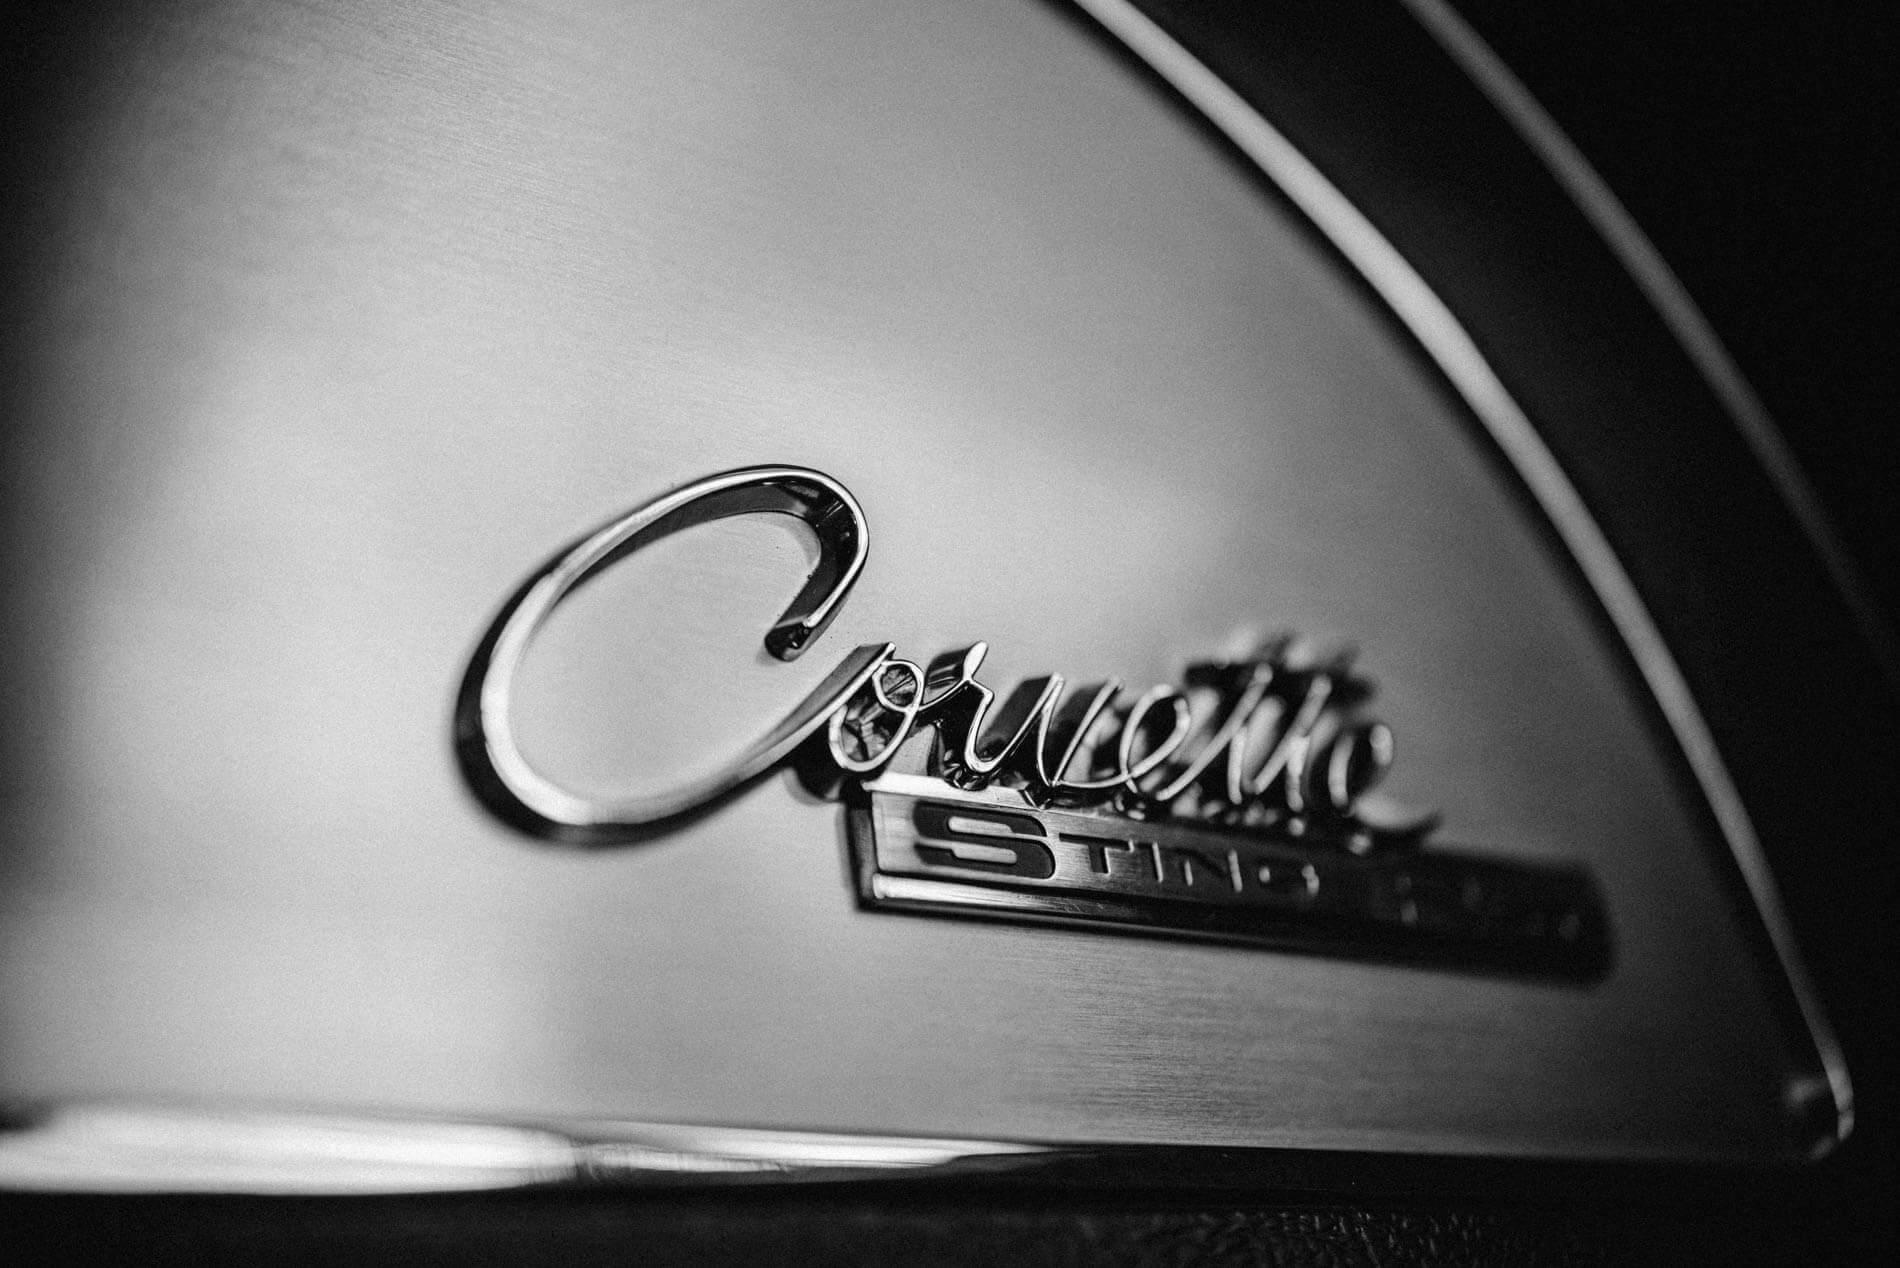 US Car Classics sascha hoecker kramm newsletter us cars classic 3